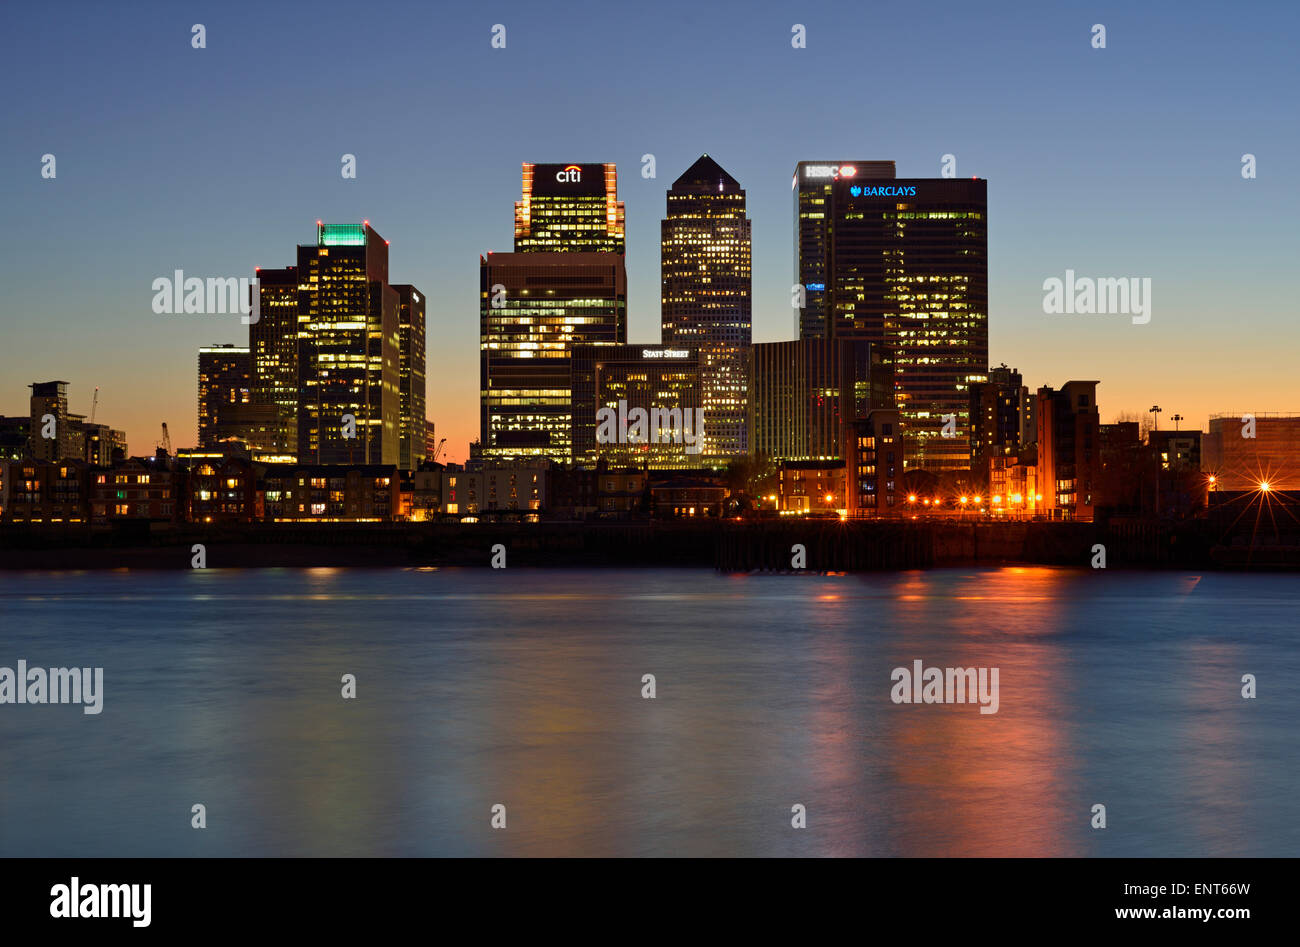 Canary Wharf Estate, Isle of Dogs, Docklands, London E14, United Kingdom - Stock Image